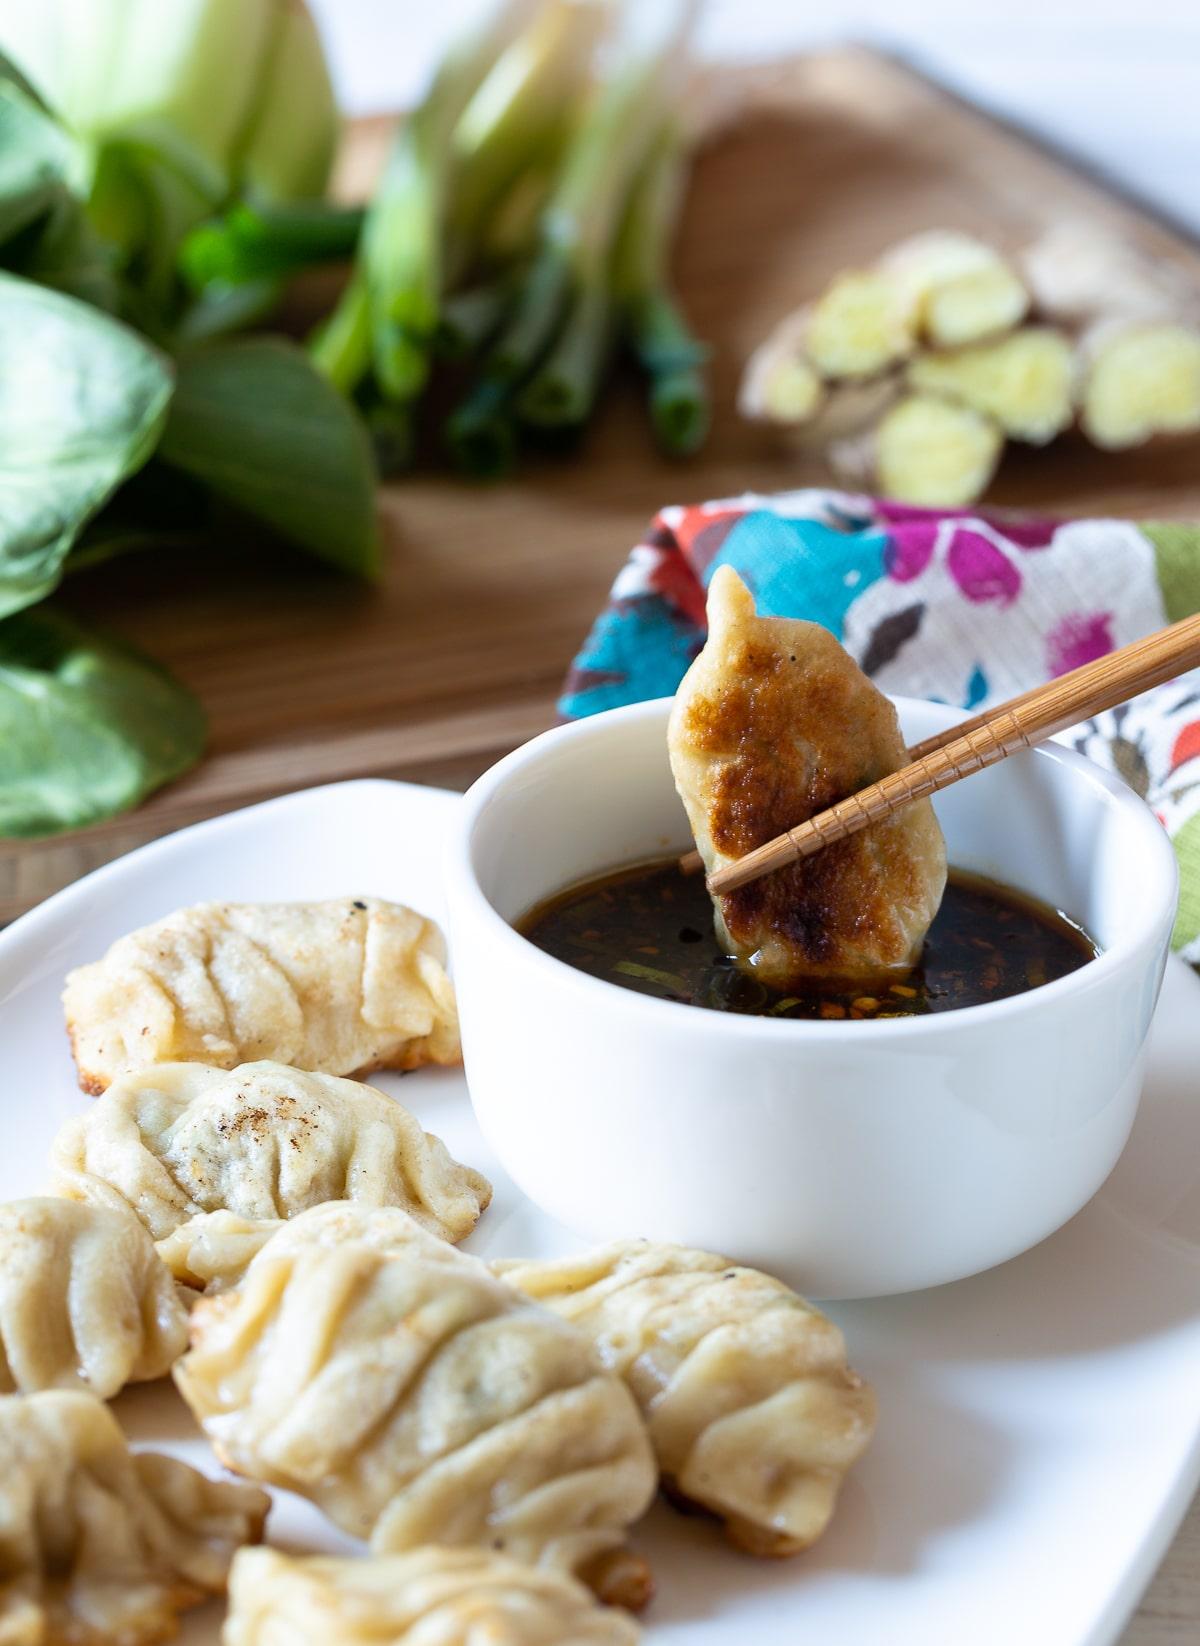 Potstickers Recipe - Chinese Dumplings  #potstickers #dumplings #chinese #appetizer #dimsum